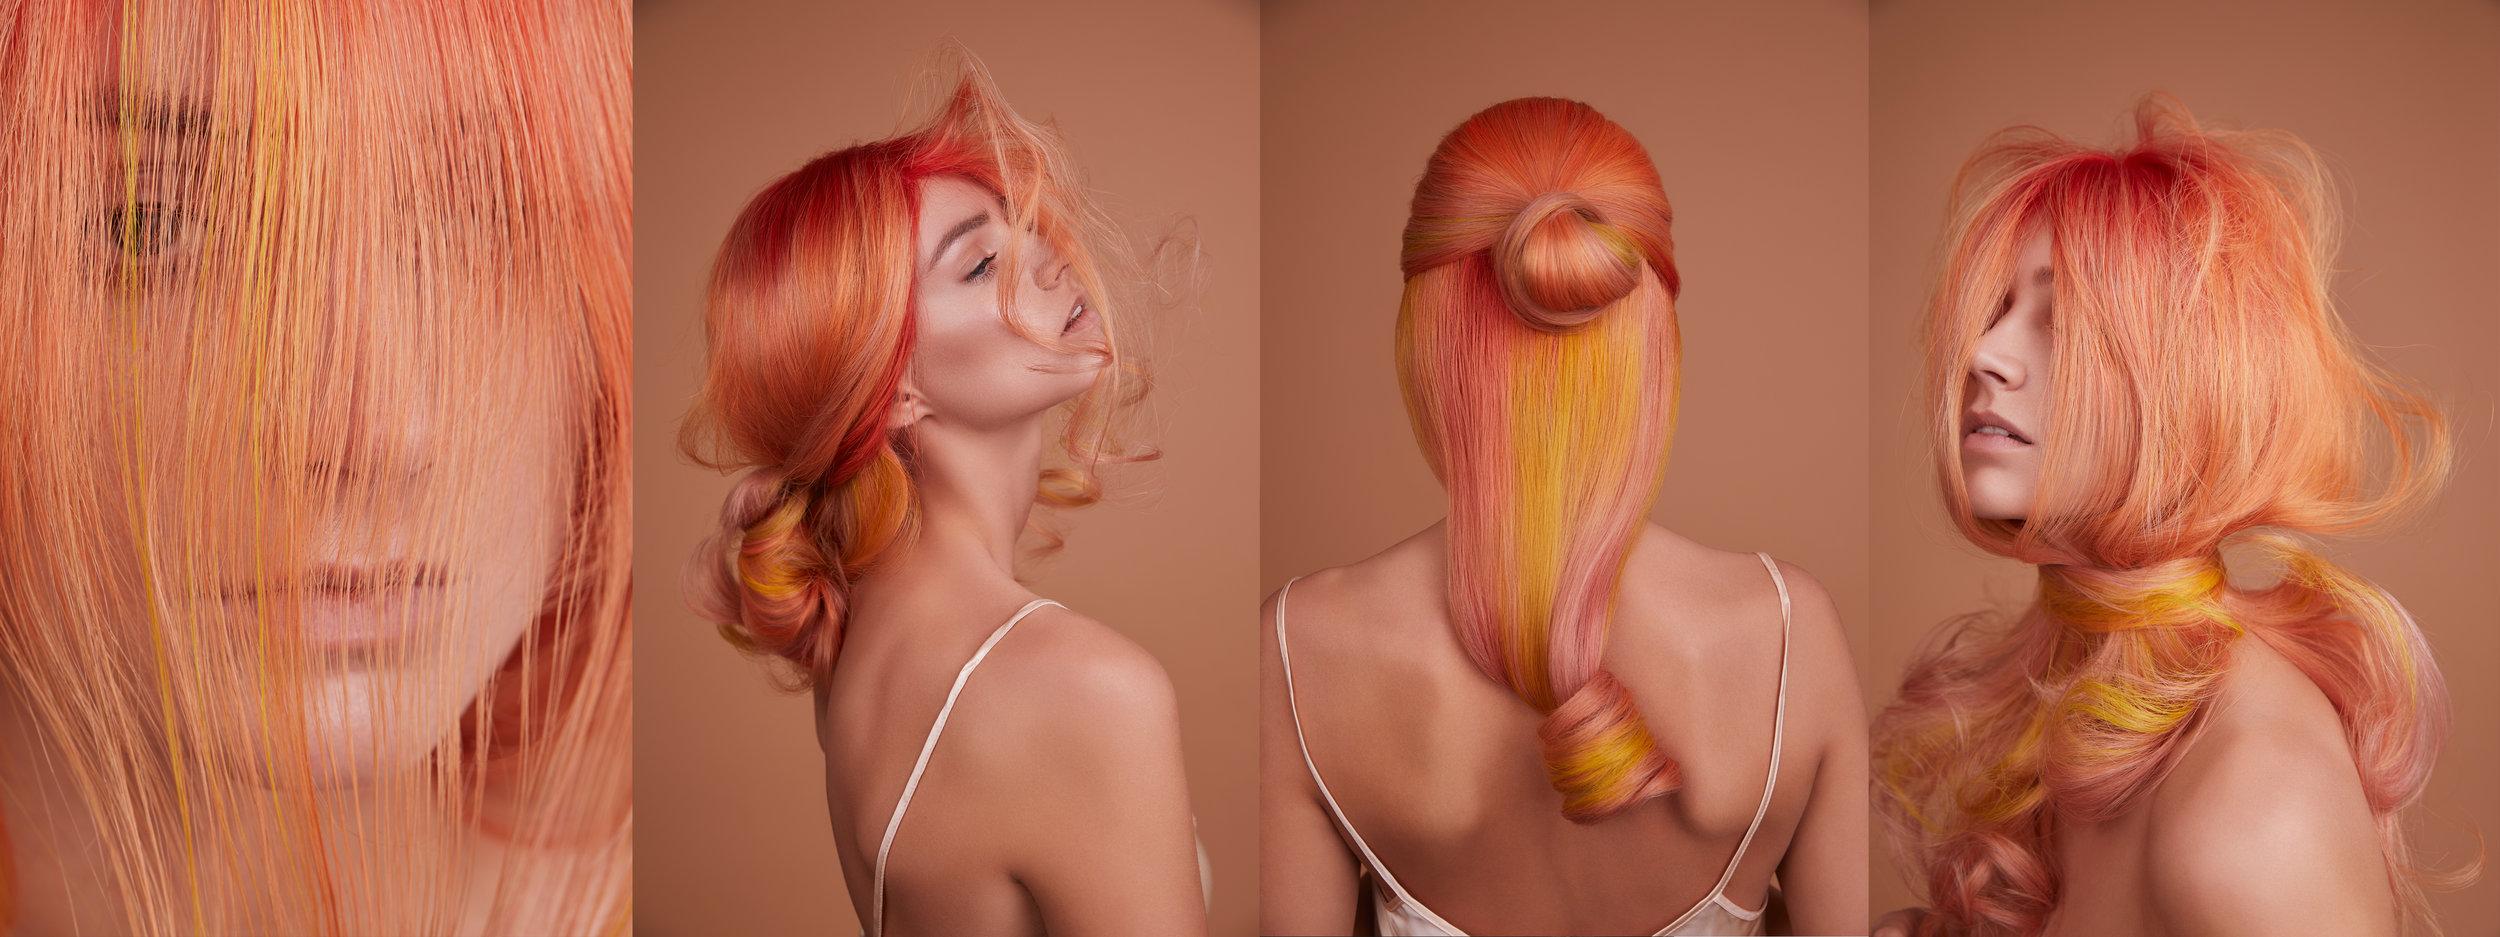 Hairdressing Award Kategorie Colour Lizzy FINAL KOLLEKTION.jpg